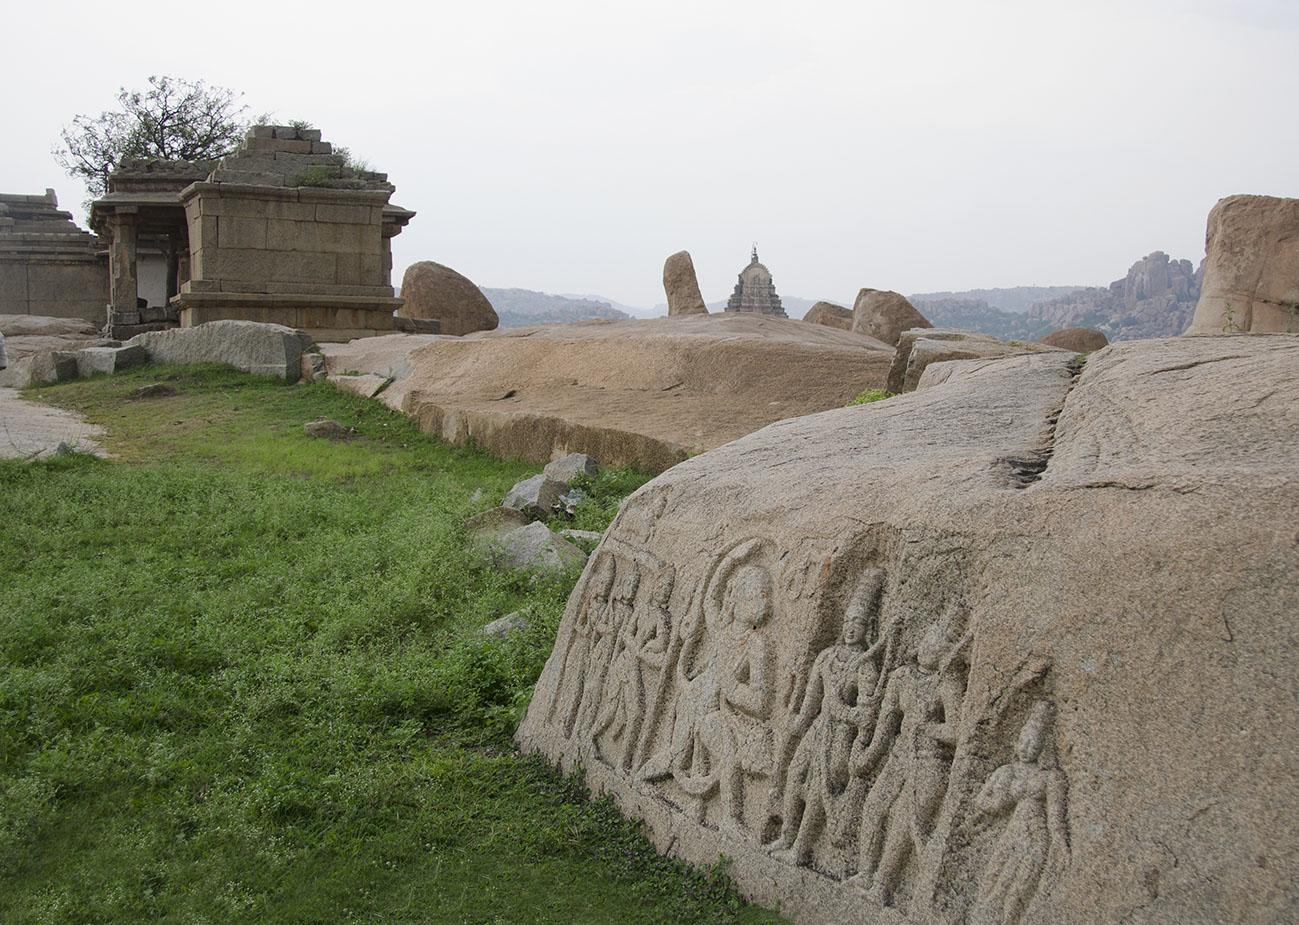 Carvings on Hemakuta hill, Hampi